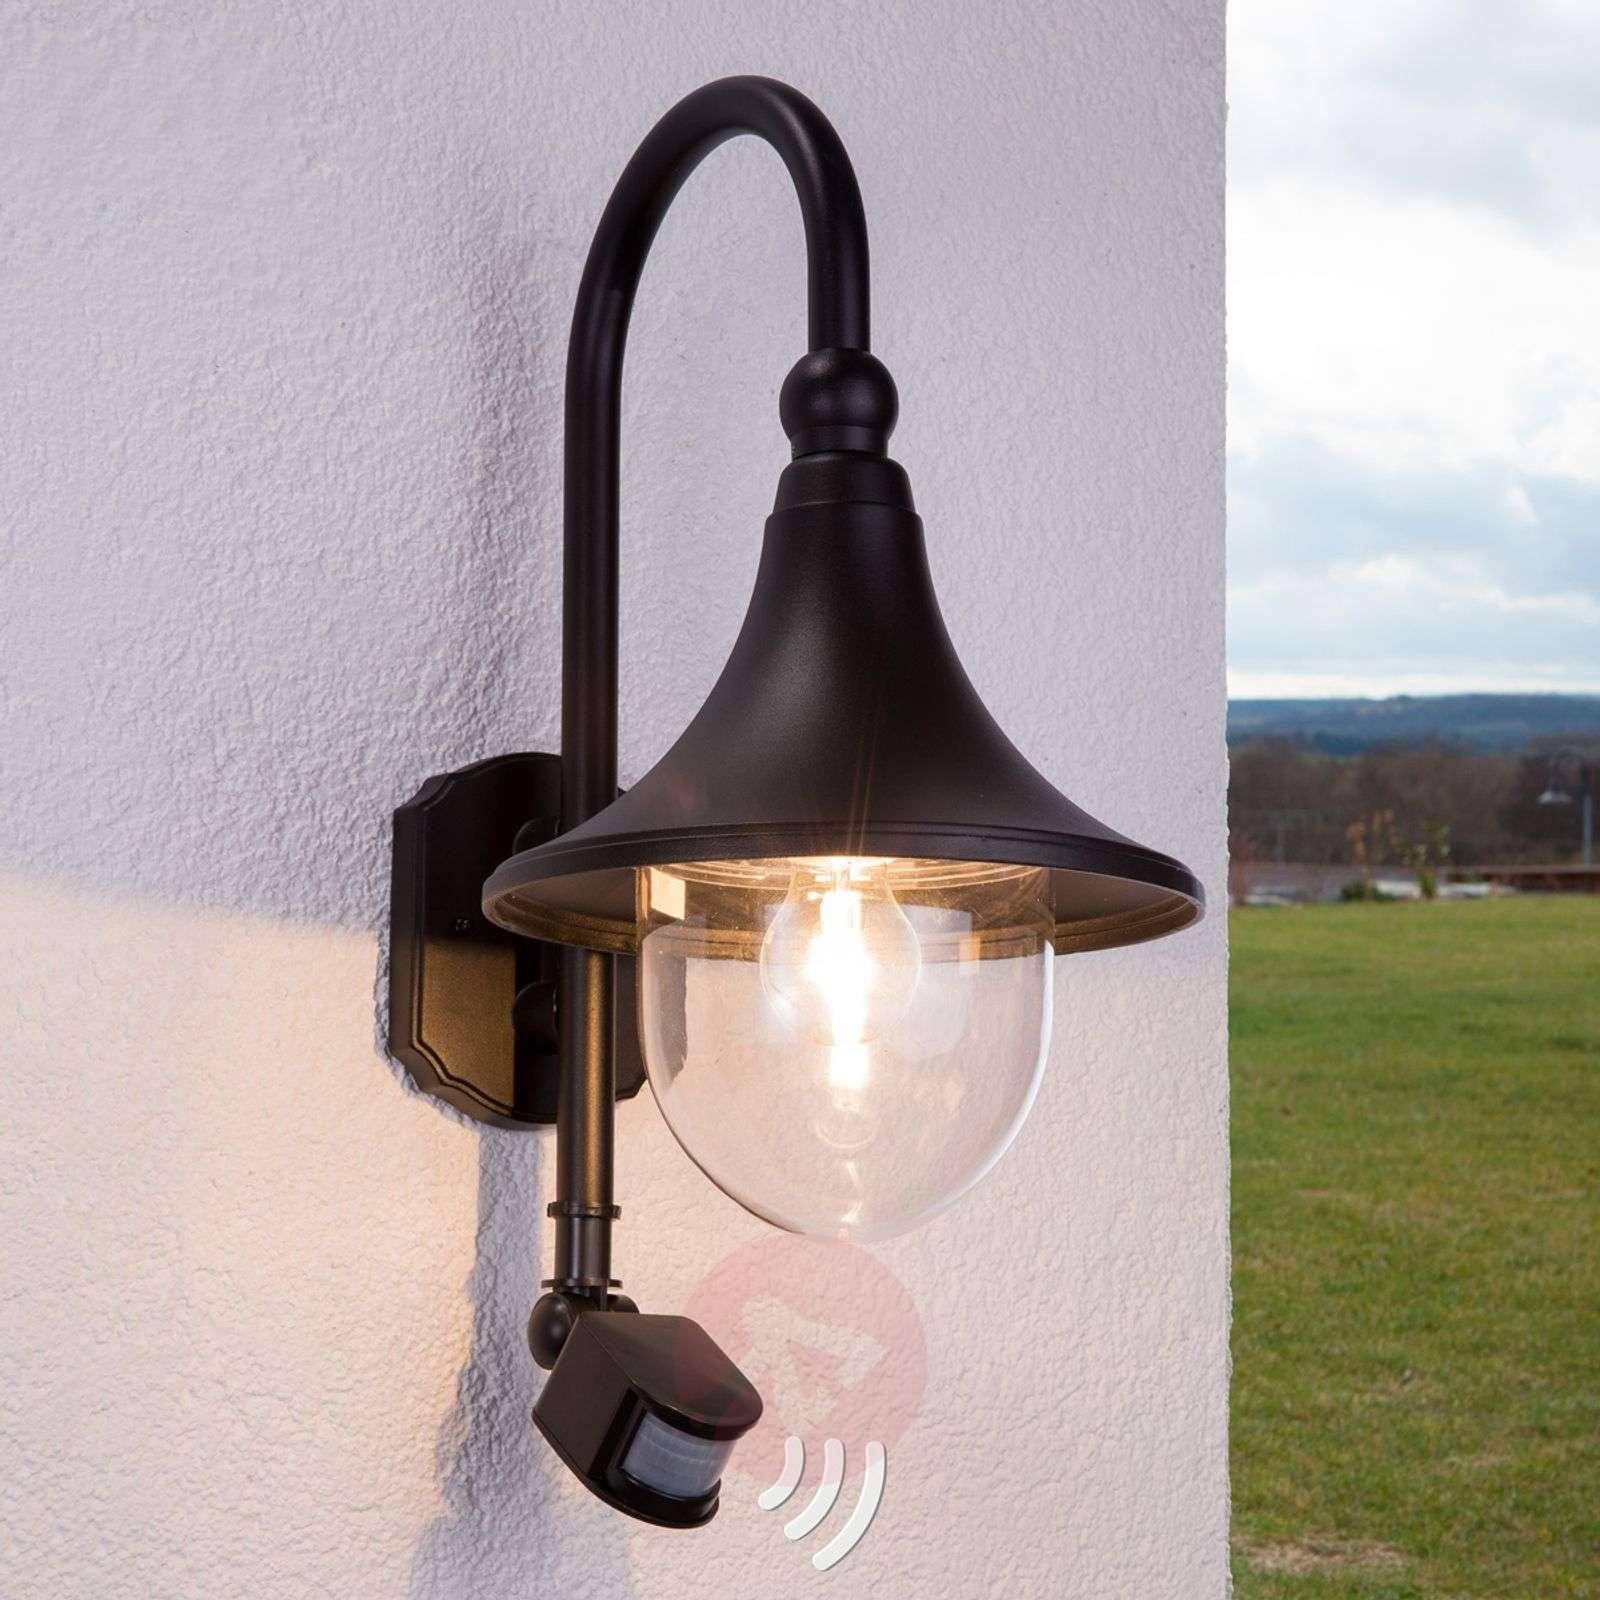 Daphne outdoor wall light with sensor-9611082-01